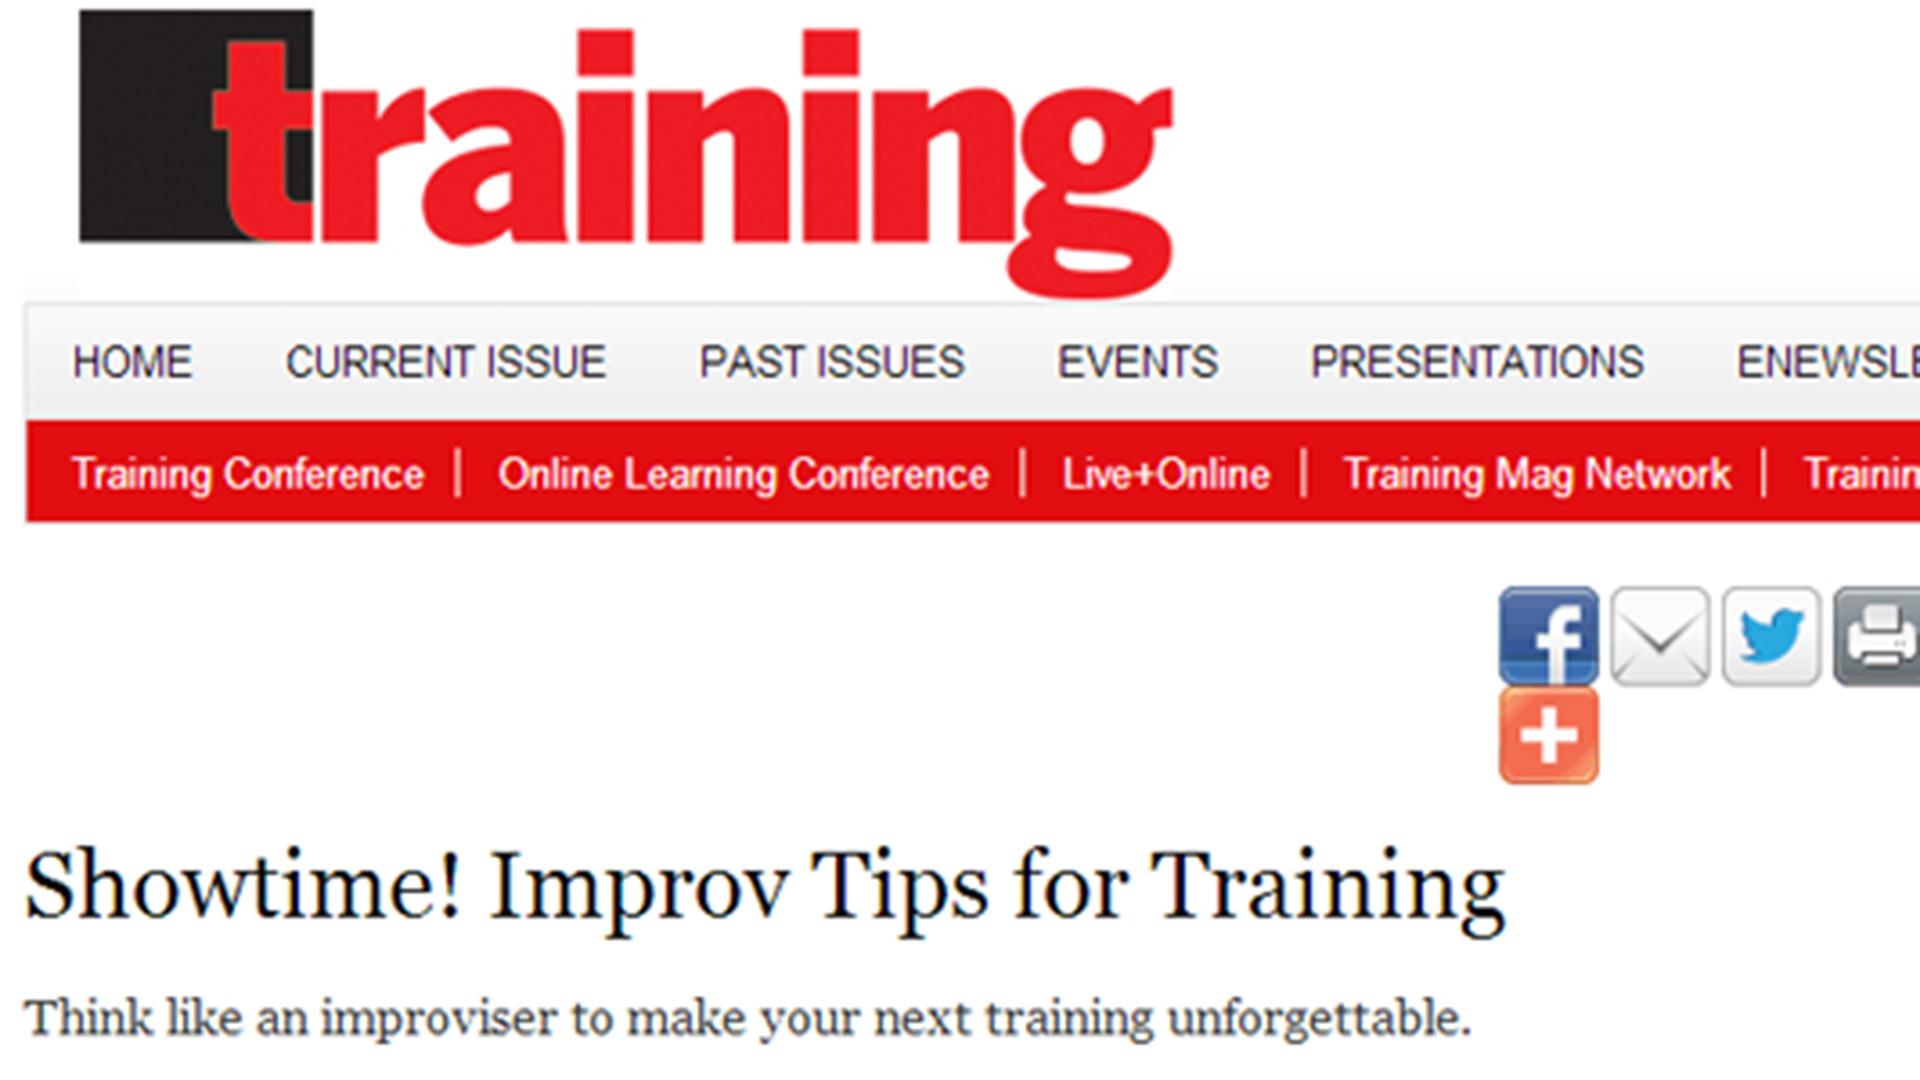 Improv Training Tips